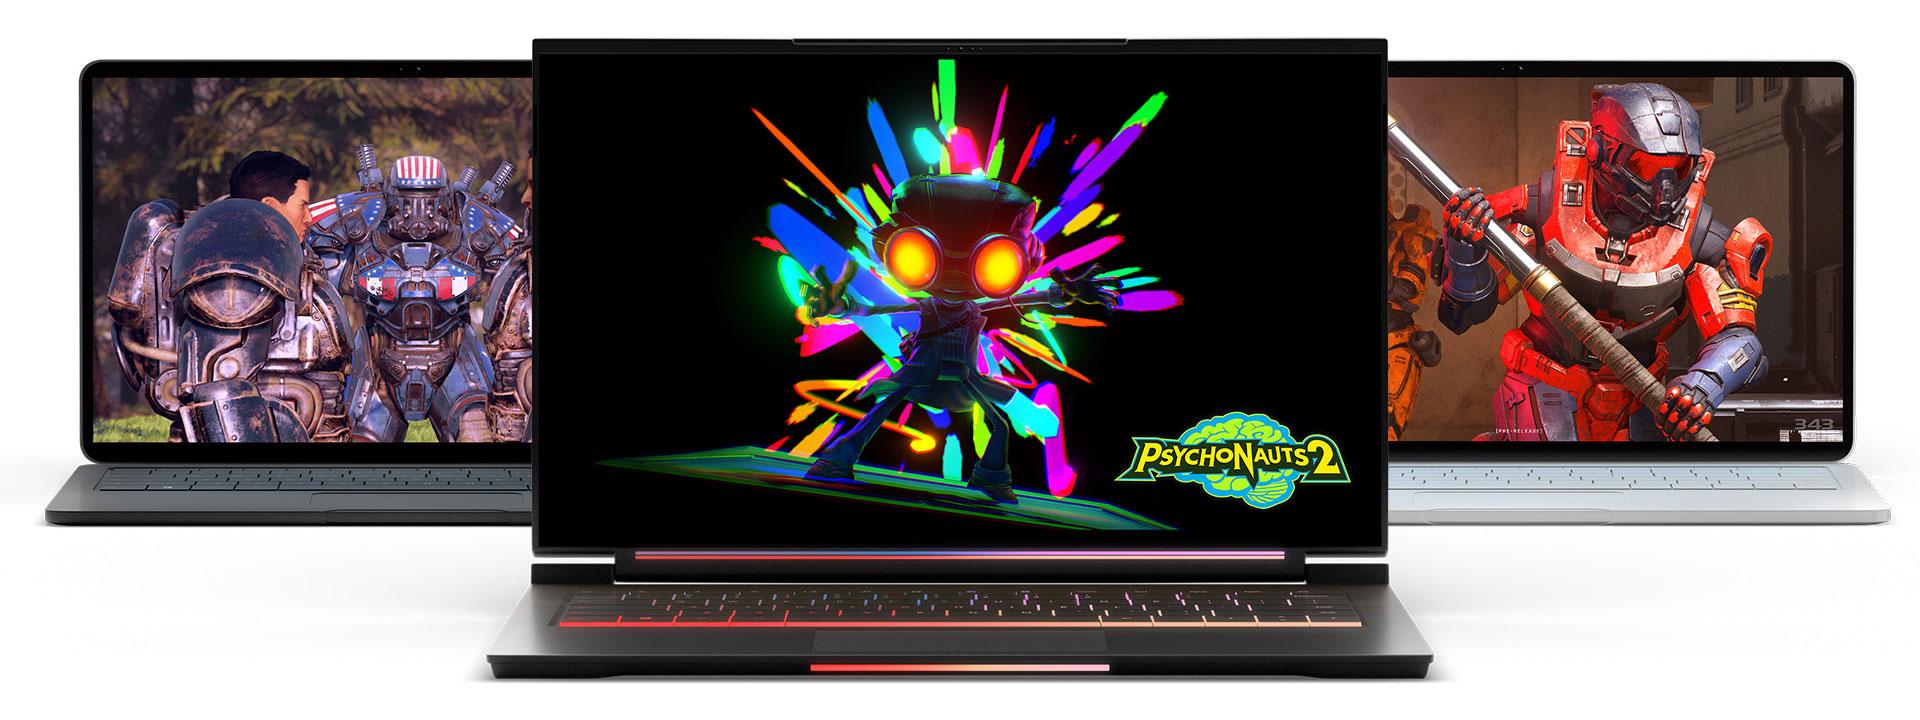 3 лаптопа с видео игри на екрана